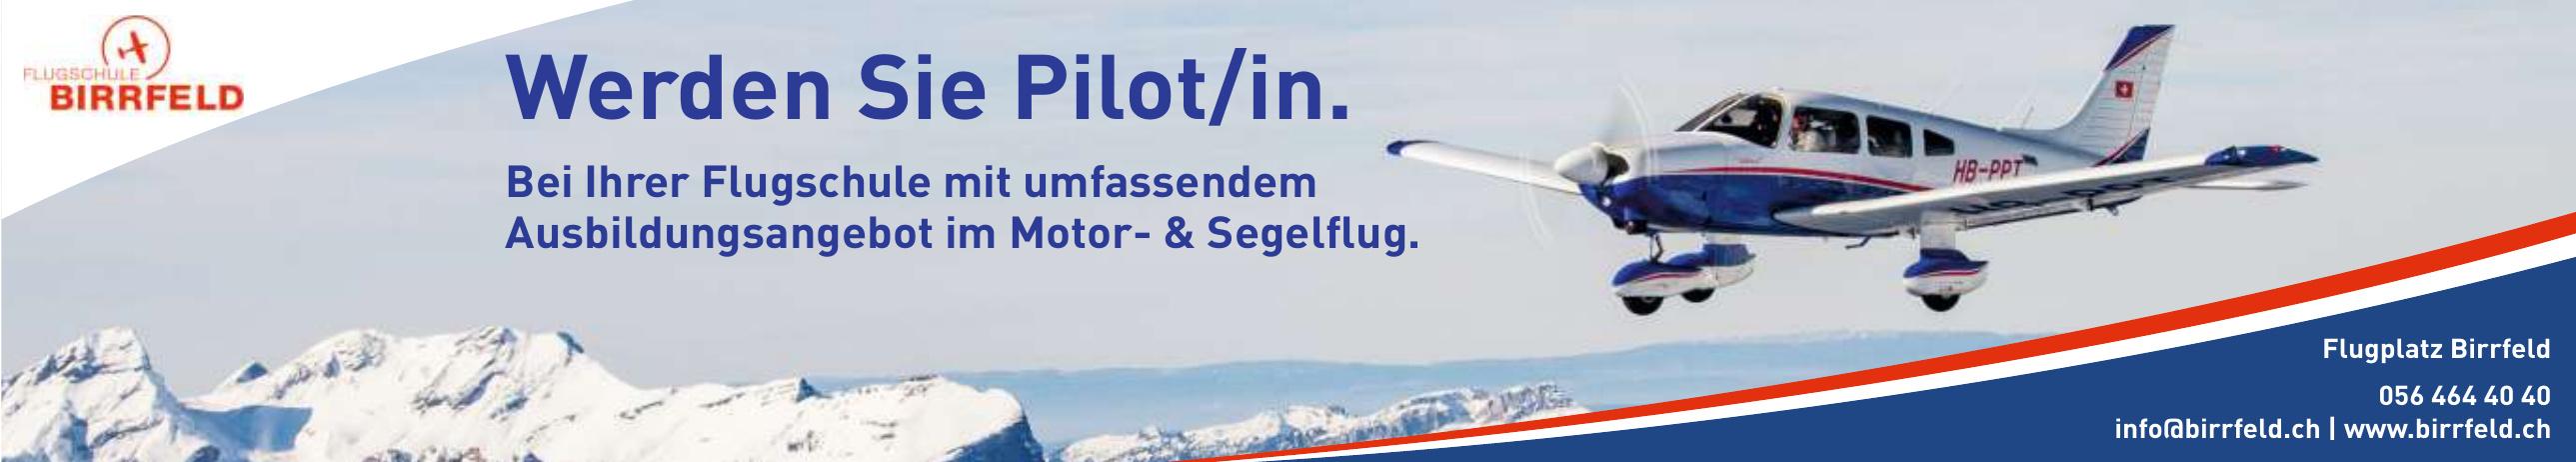 Flugschule Birrfeld